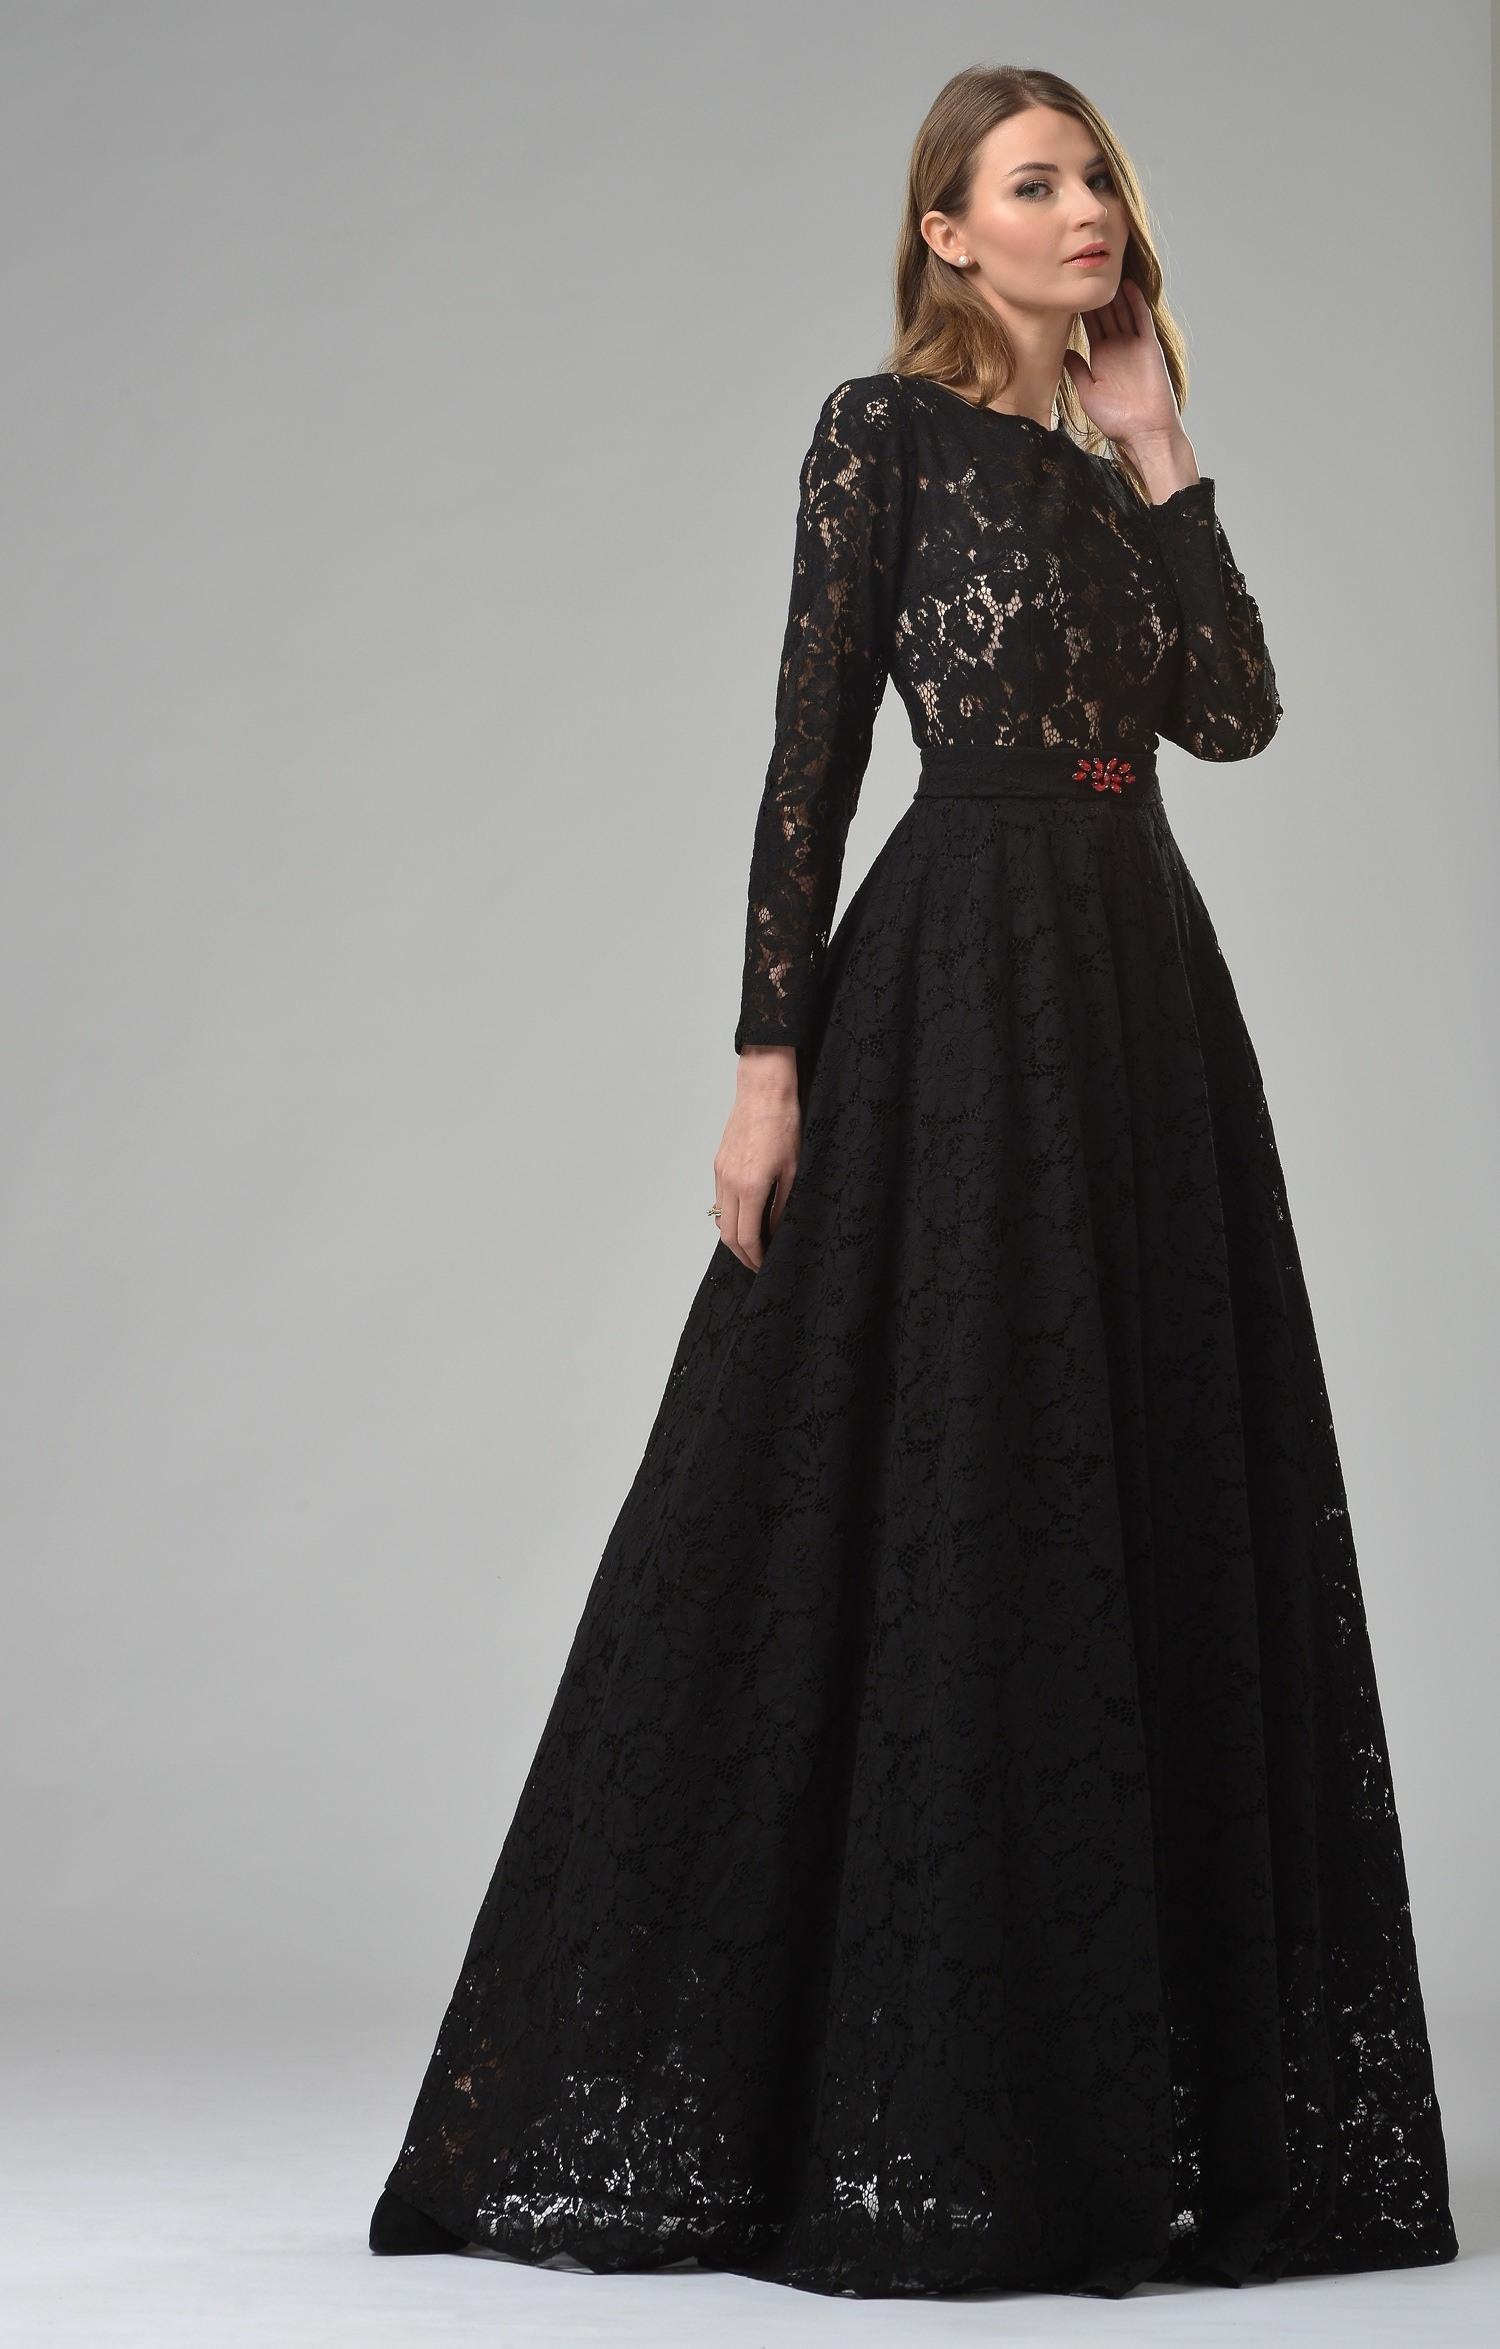 Formal Wunderbar Schwarzes Abendkleid Lang für 2019 Schön Schwarzes Abendkleid Lang Ärmel